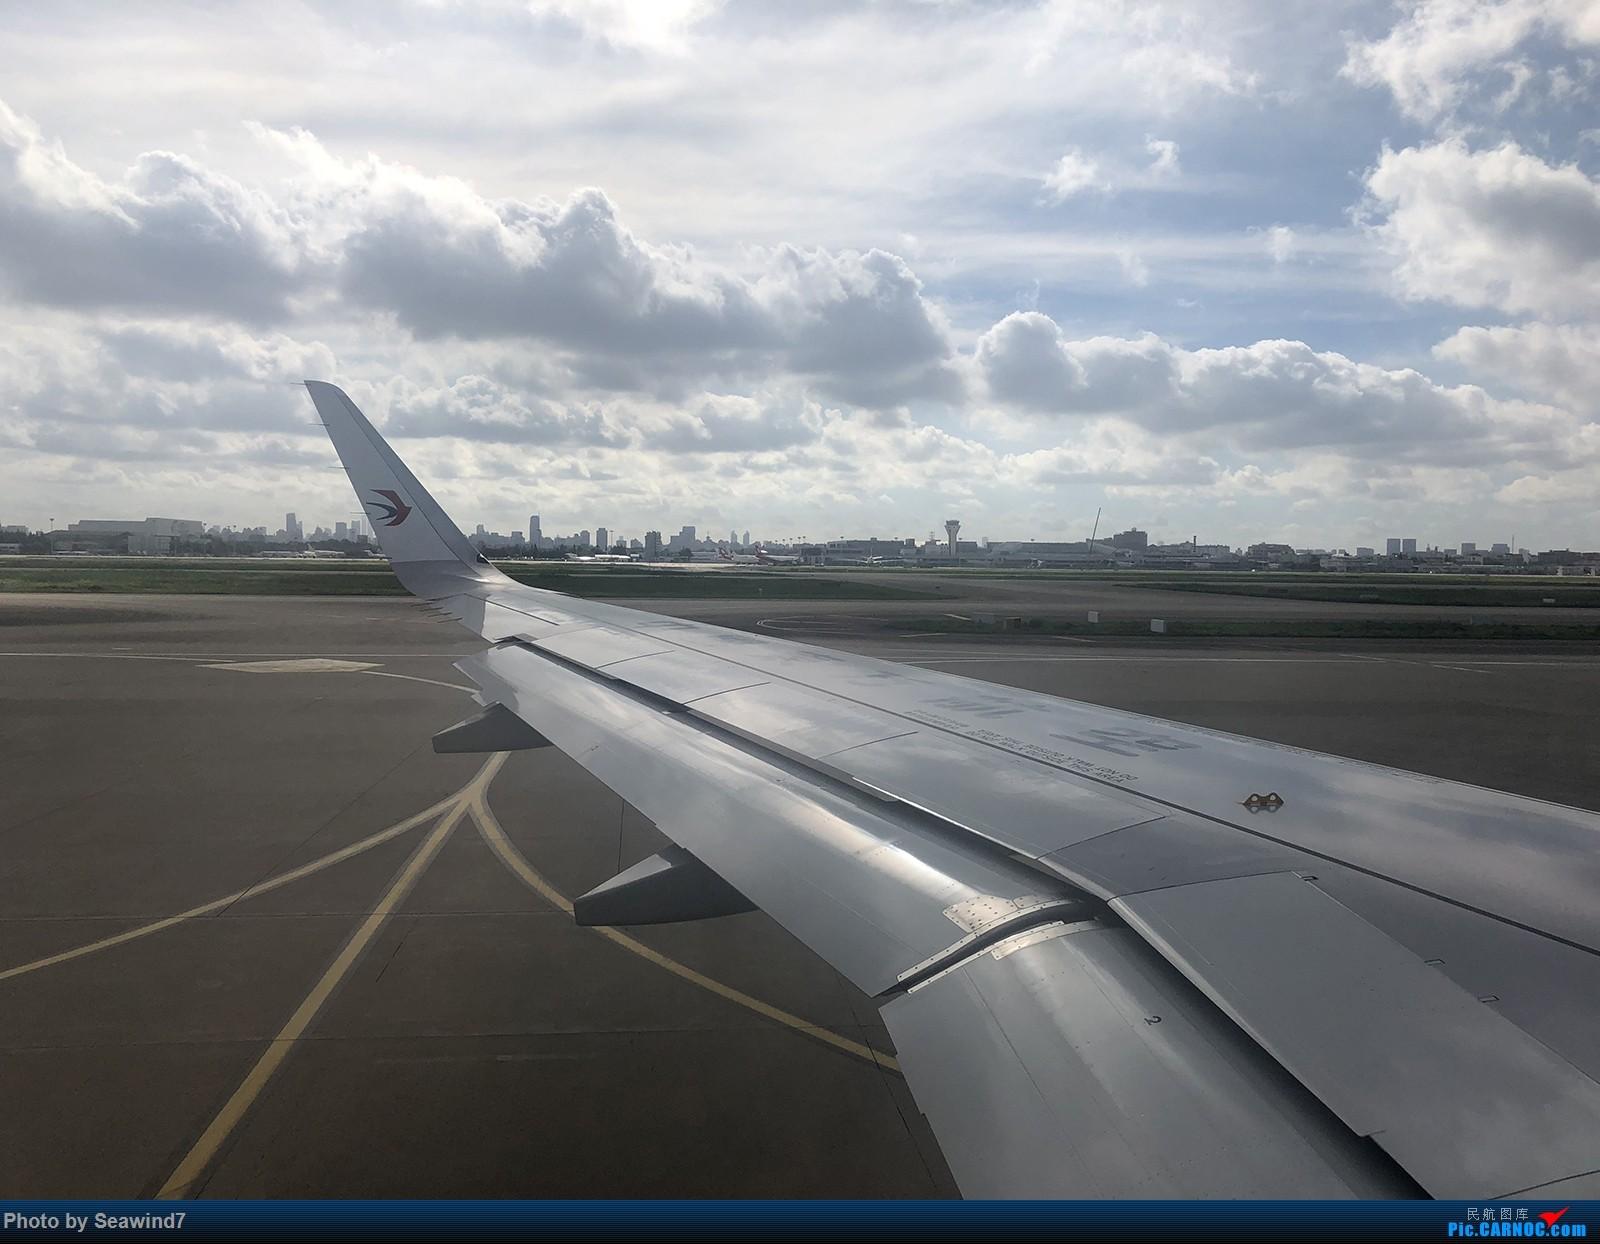 Re:[原创]东航第一架字母机/第二架320neo乘坐记 AIRBUS A320NEO B-300R 中国上海虹桥国际机场